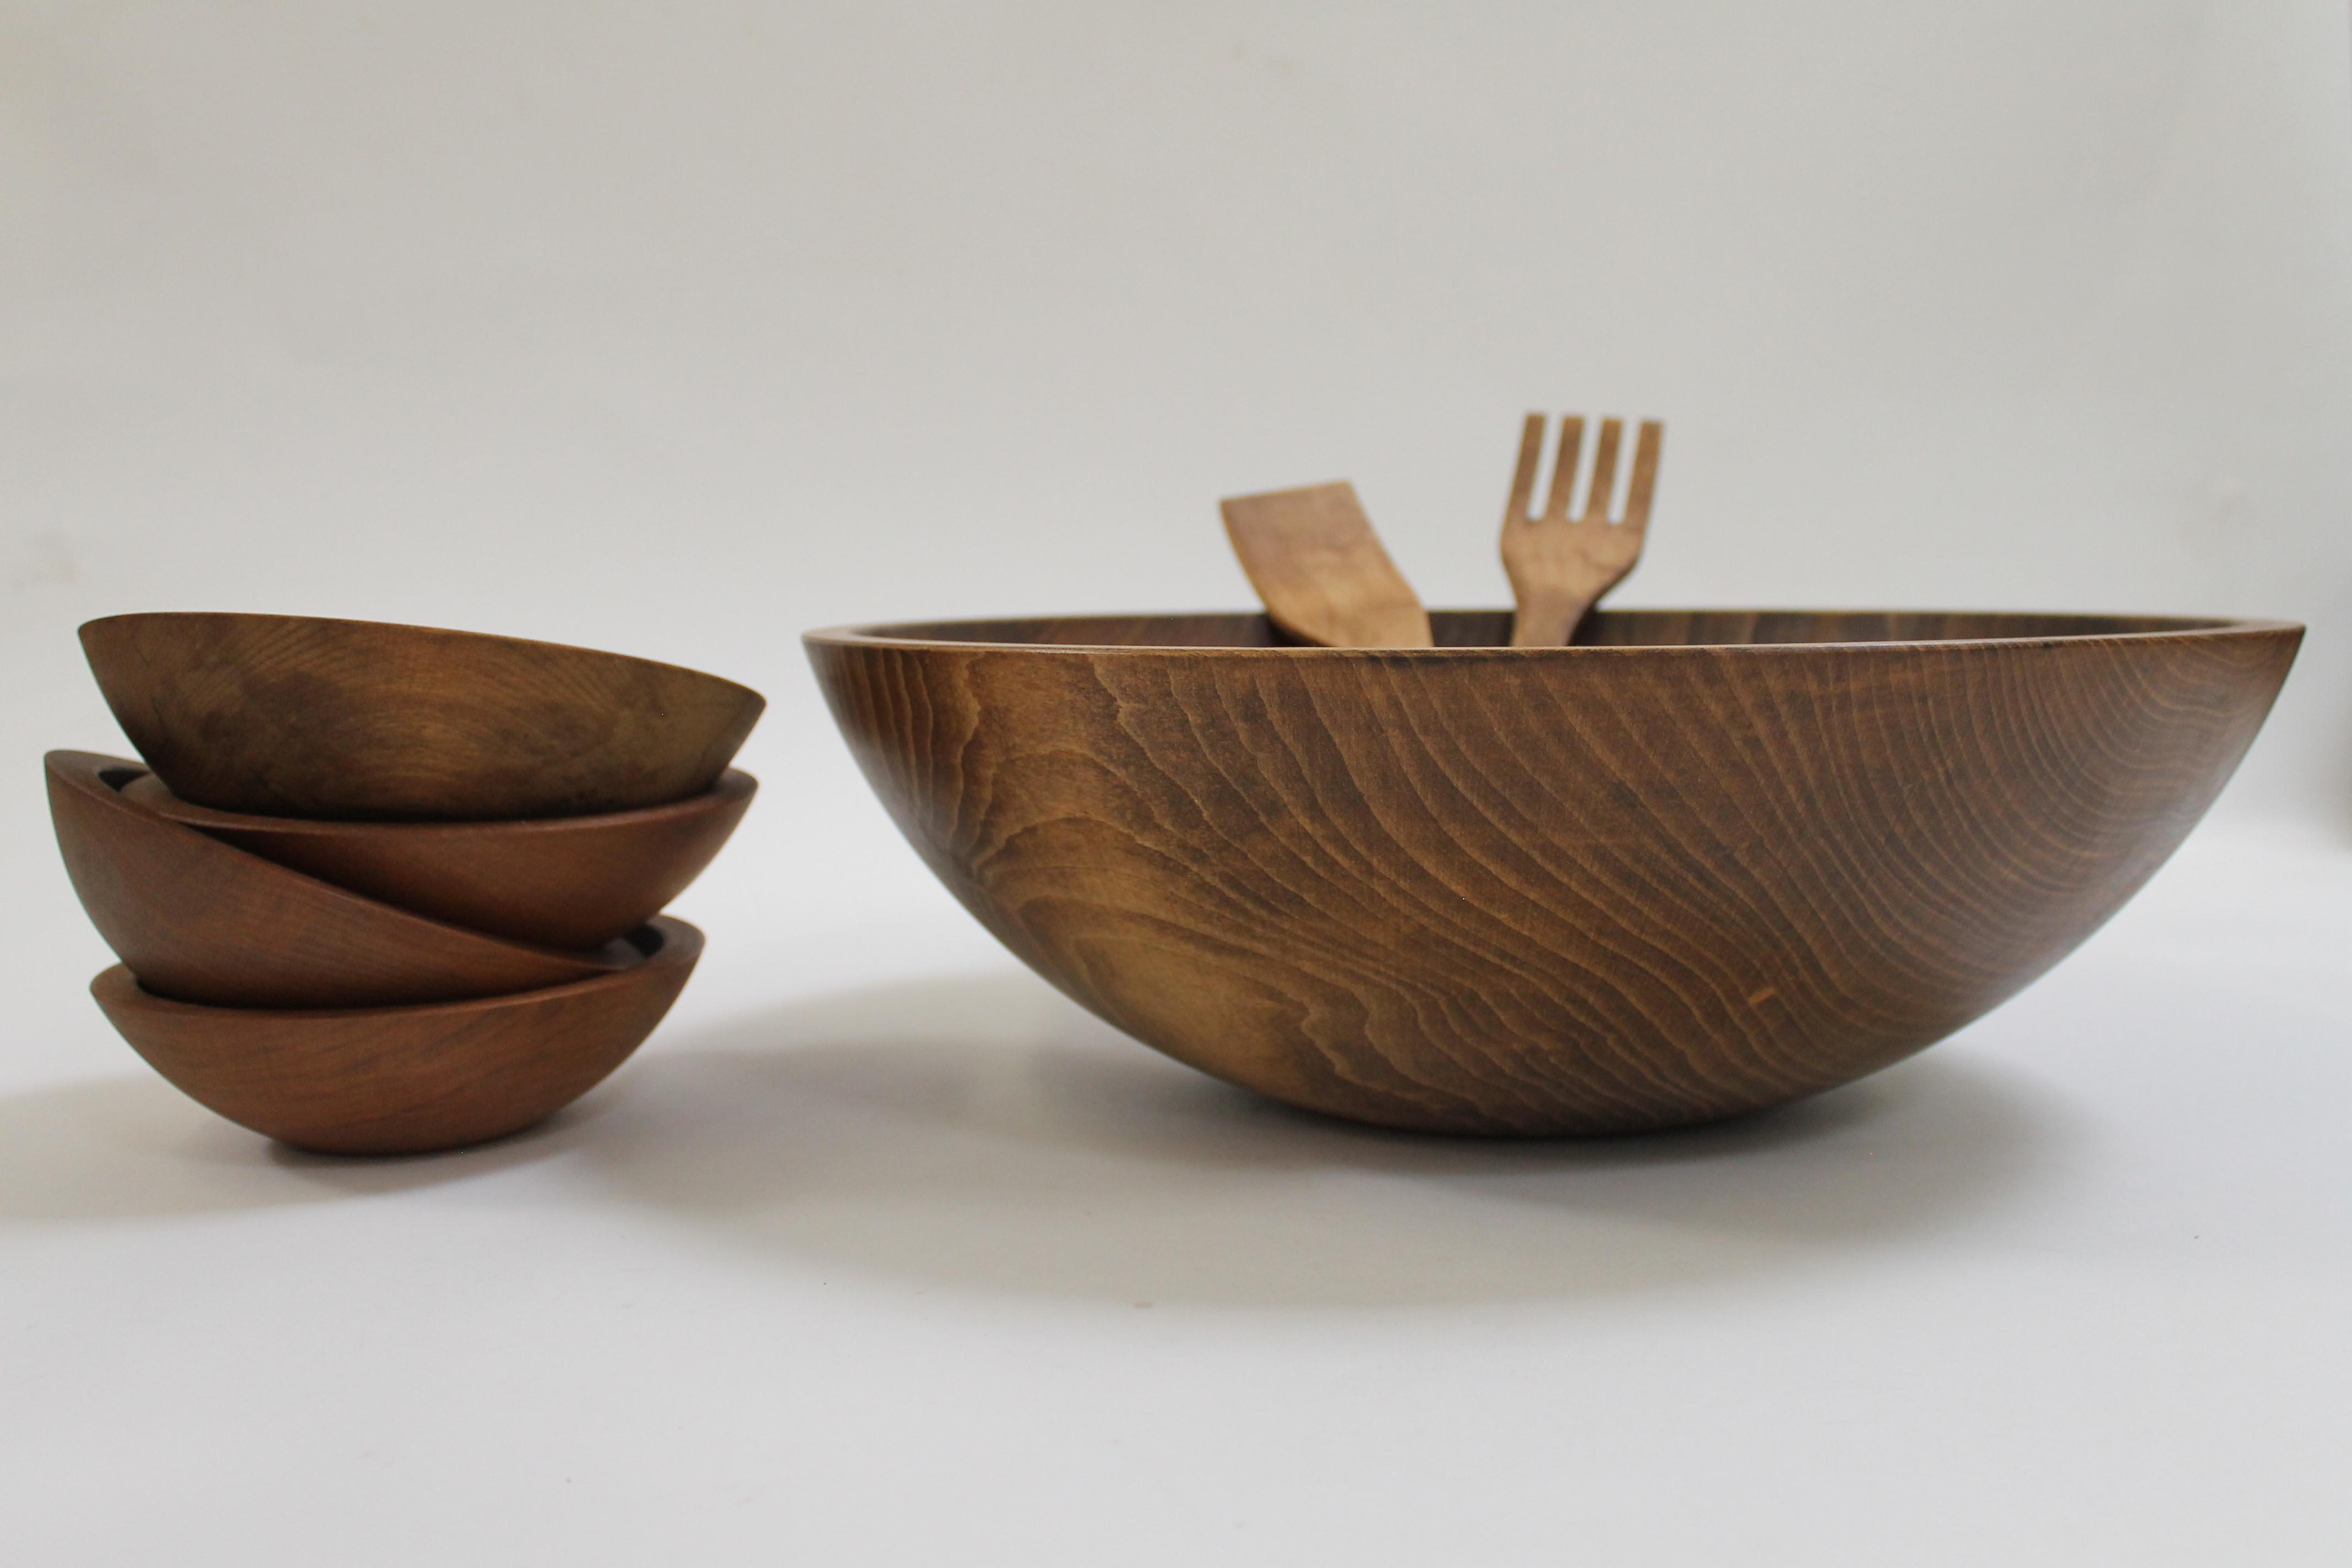 17 inch Beech Bowl Set - Dark Walnut Finish 117WBDK5S